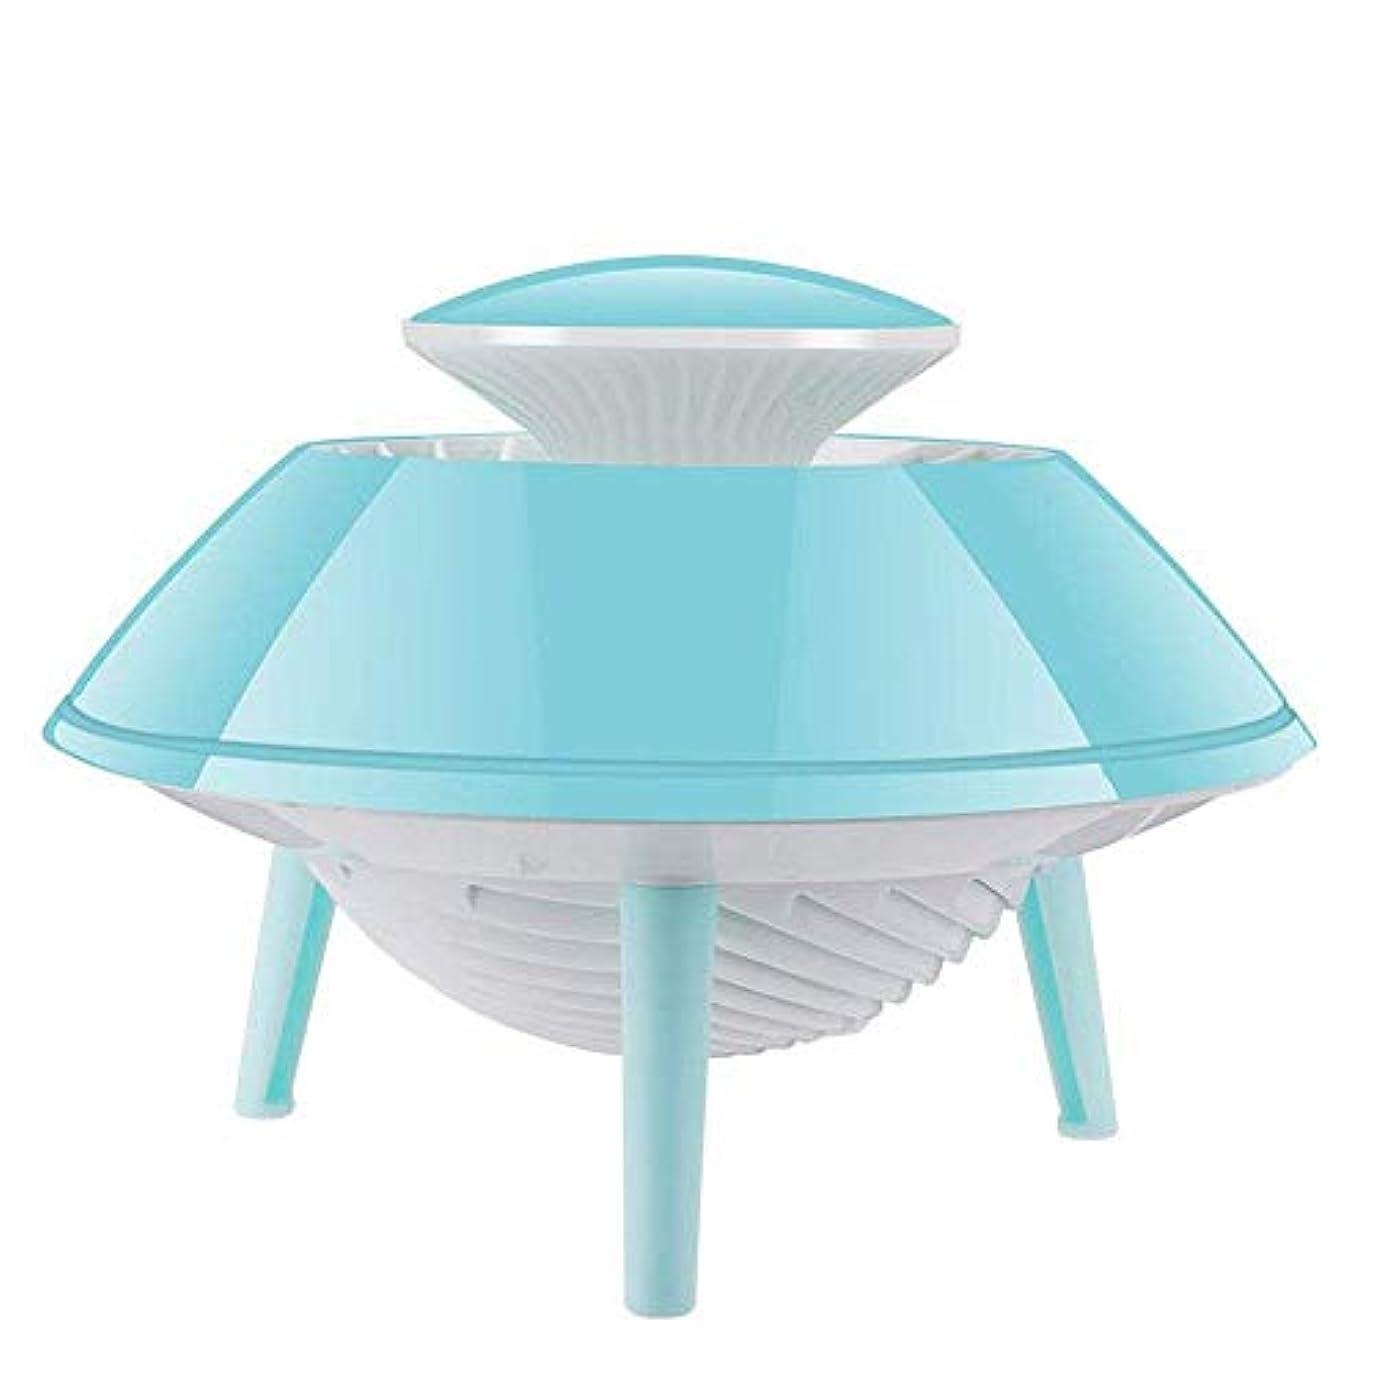 LC_Kwn 蚊キラー、創造的な「空飛ぶ円盤」ミュート非放射「光制御」蚊キラー、家庭用母子蚊忌避ランプ